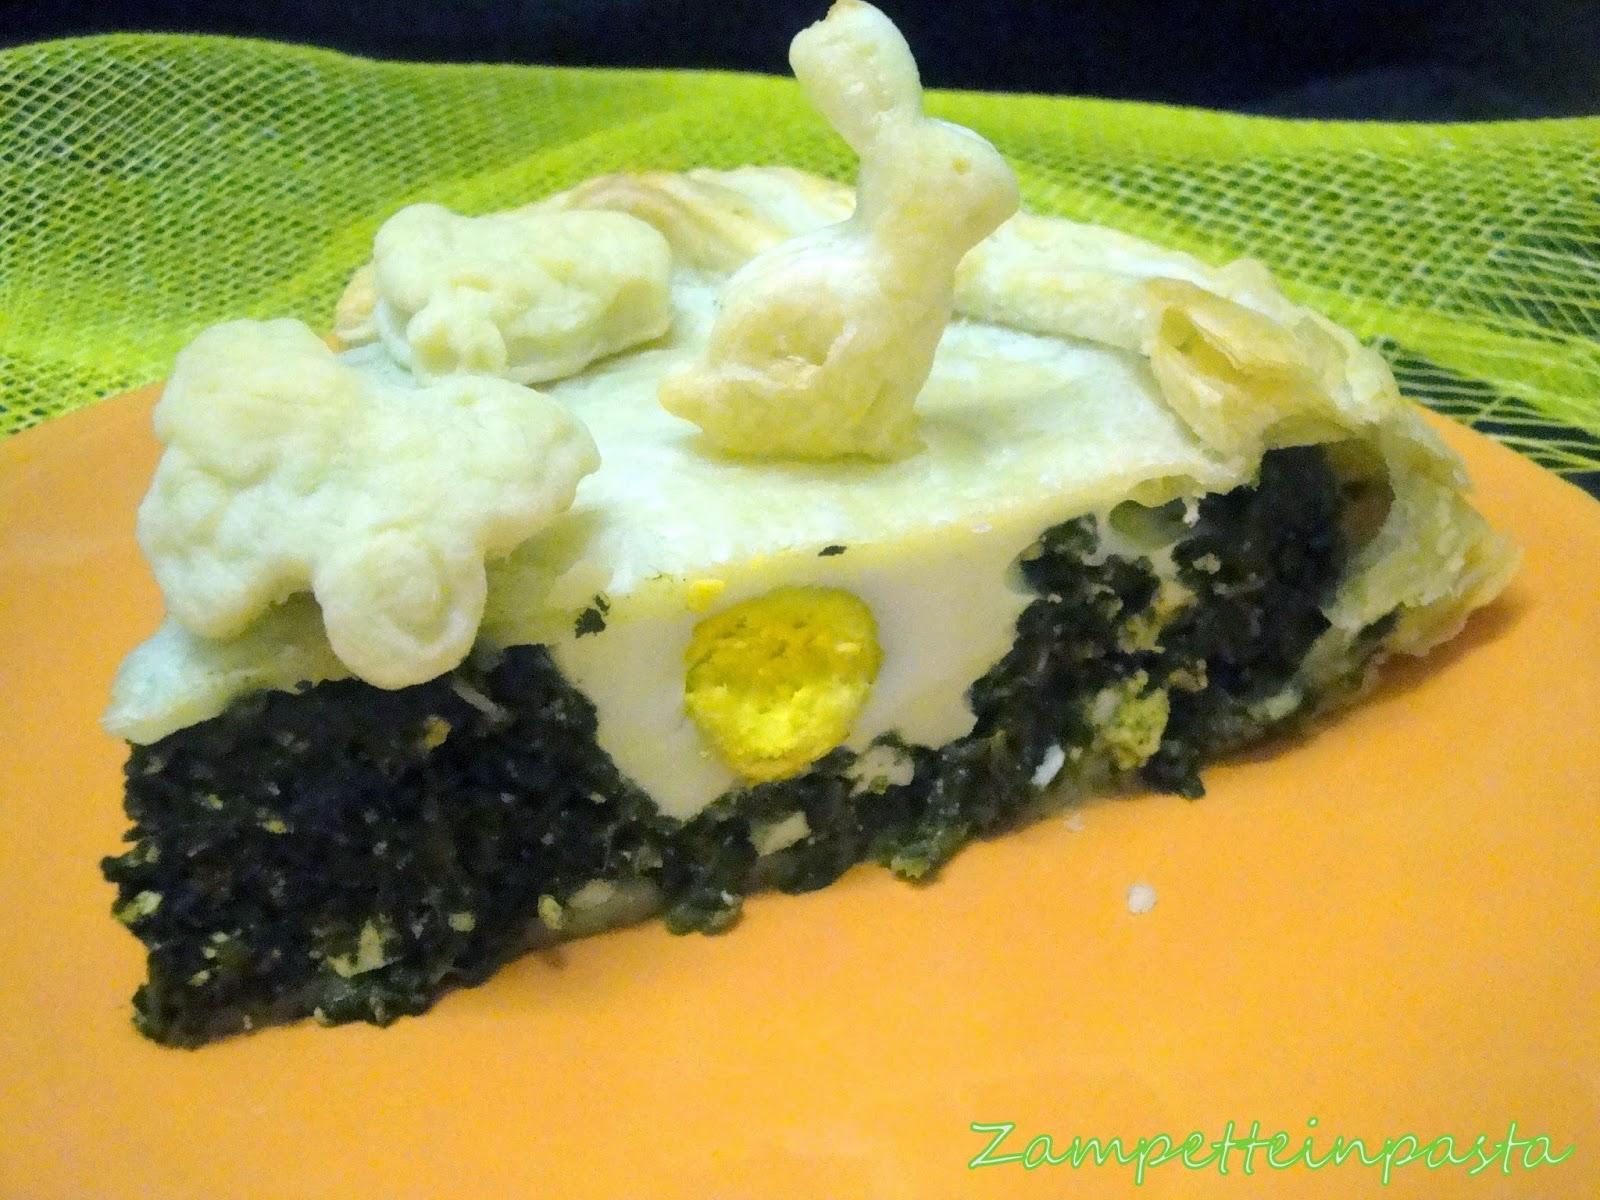 Torta pasqualina - Ricetta di pasqua